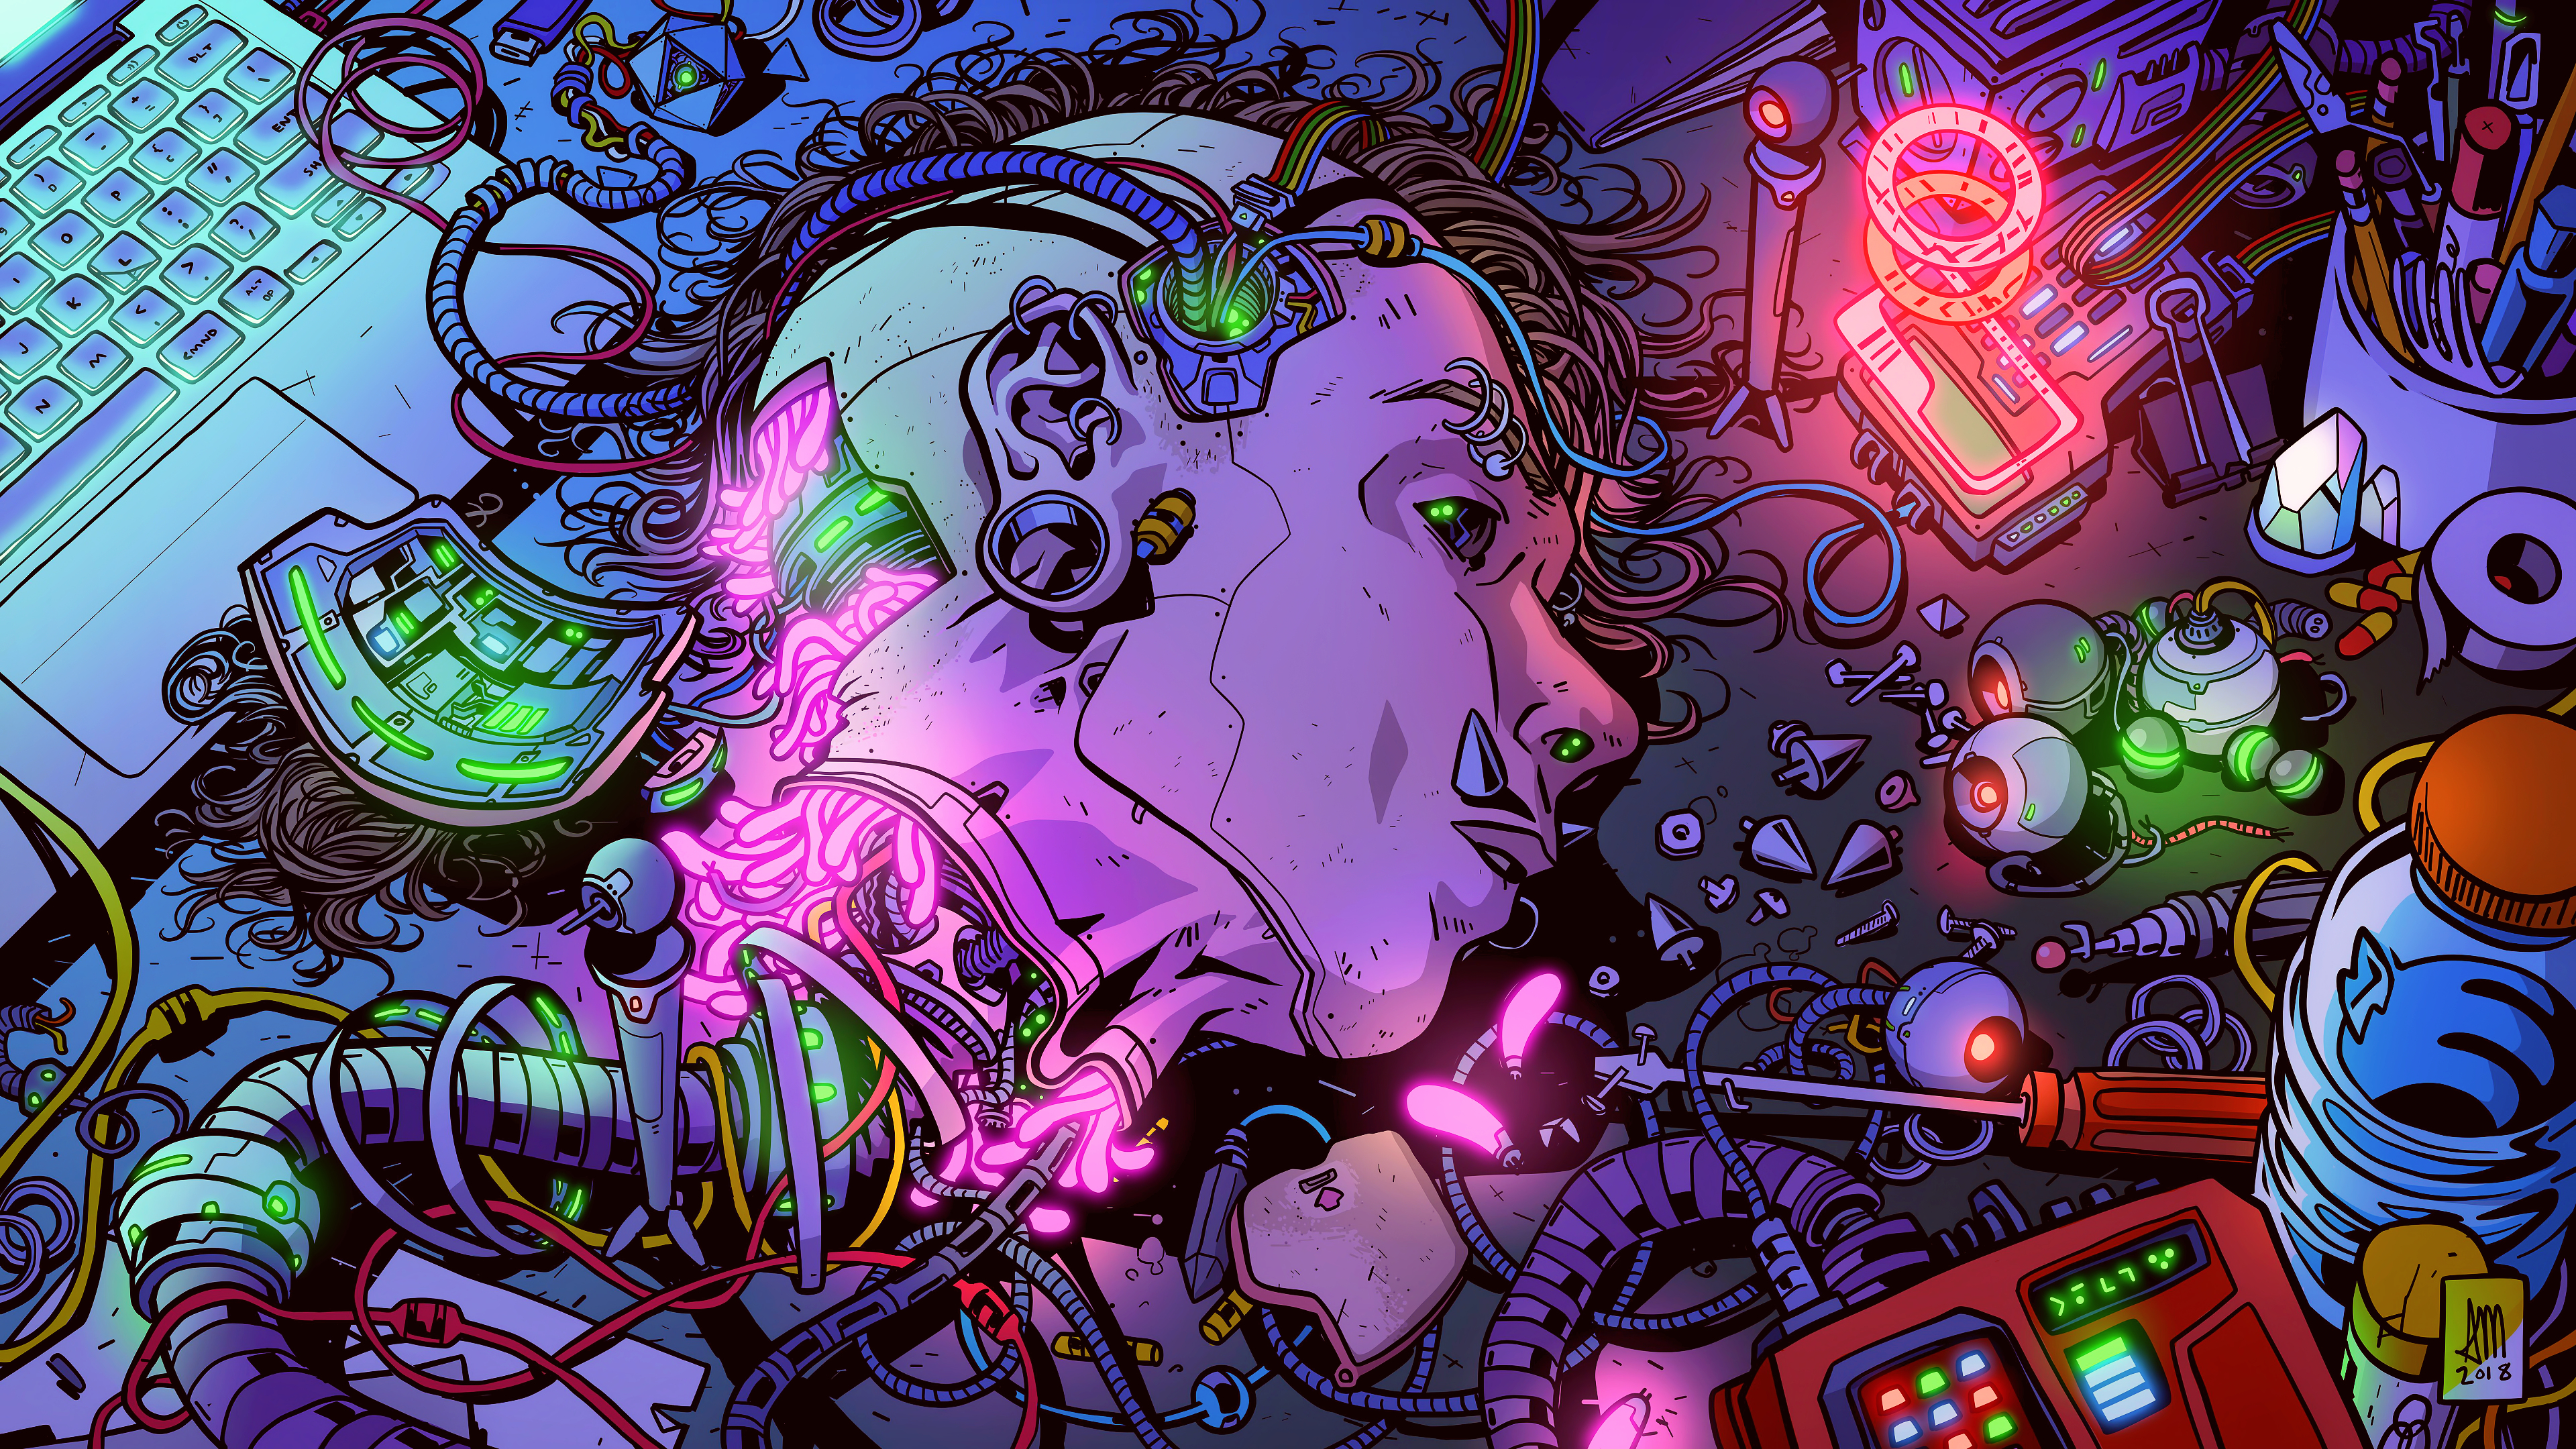 General 3840x2160 cyber science fiction digital art concept art cyberpunk artwork futuristic fantasy art fan art